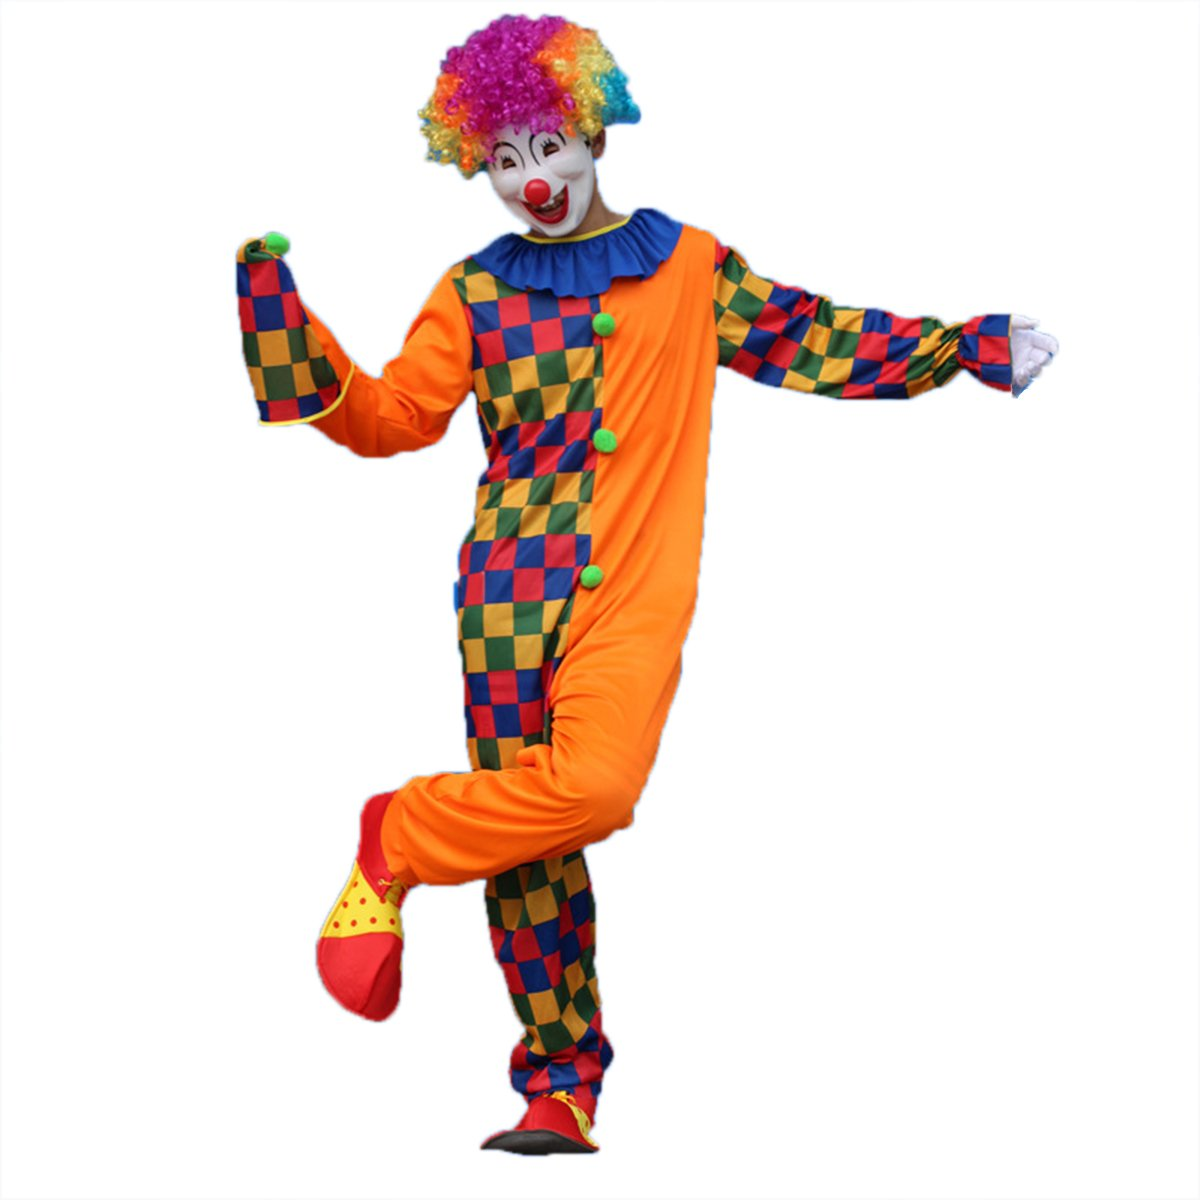 Amazon.com: luoem Carnaval Disfraz de payaso Halloween ...